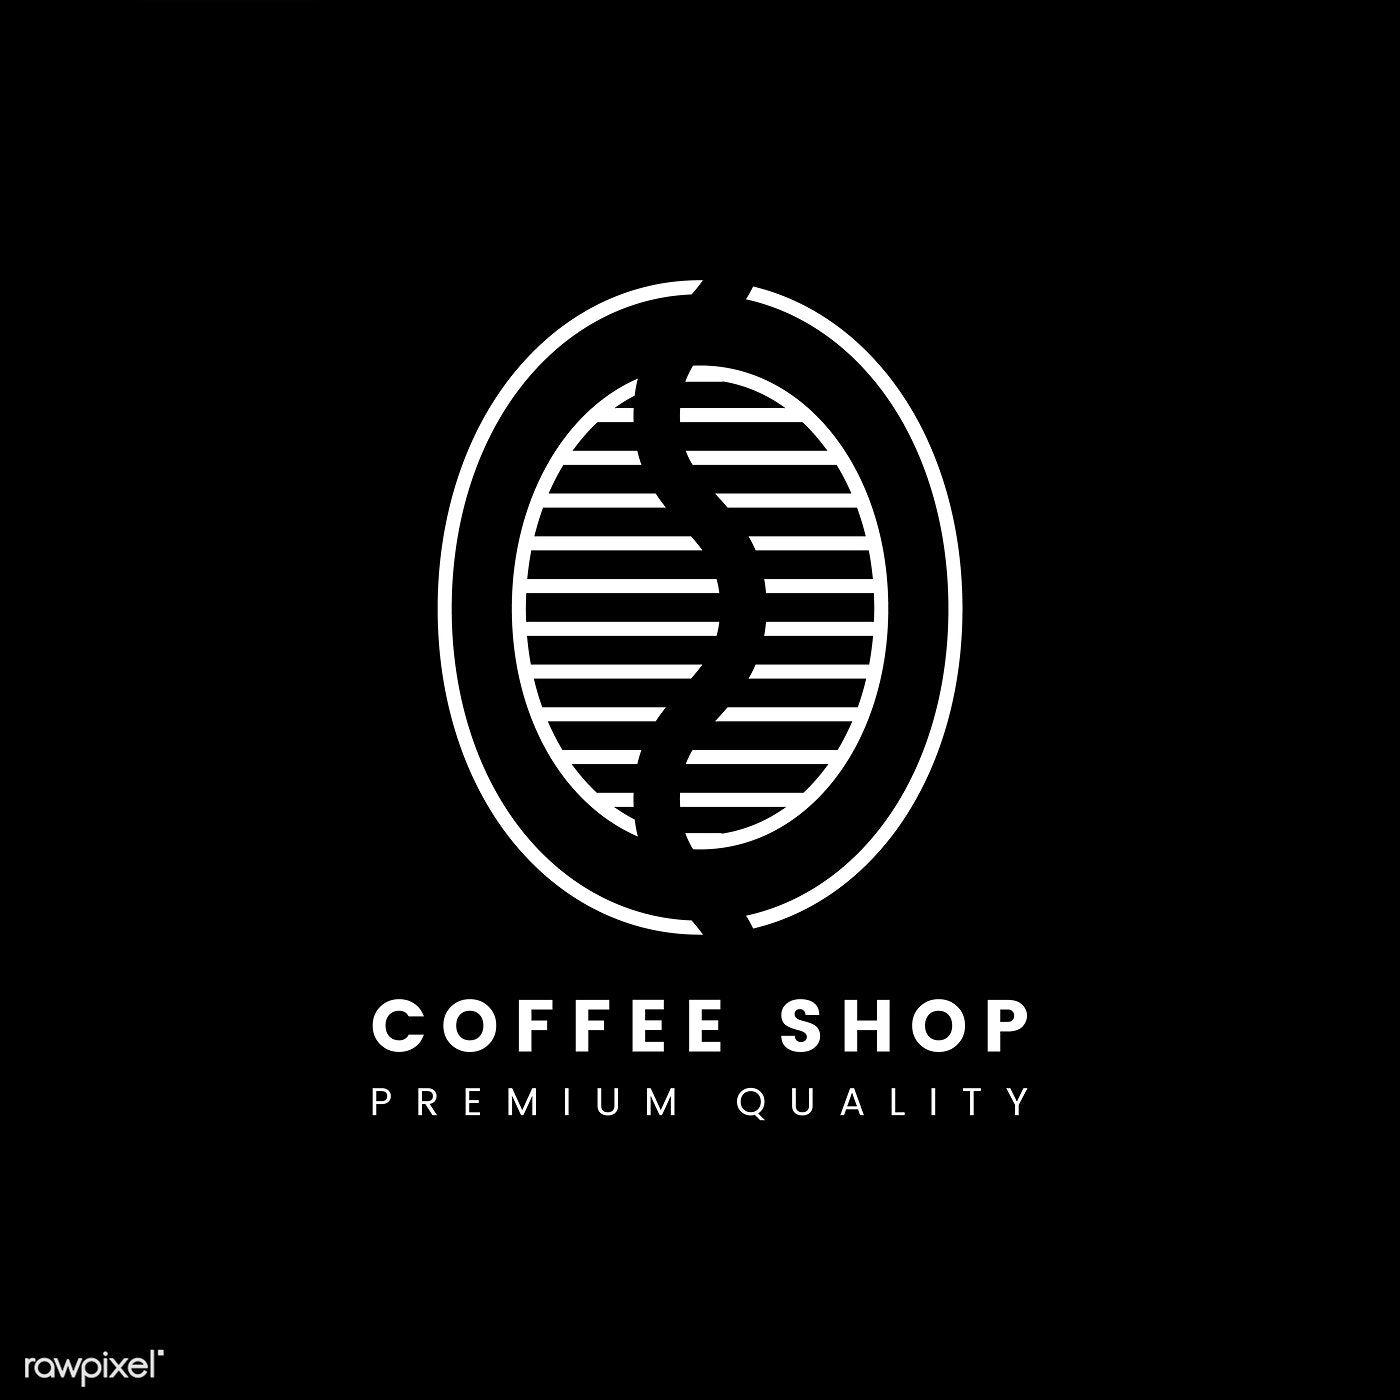 Premium Quality Coffee Shop Logo Vector Free Image By Rawpixel Com Coffee Shop Logo Cafe Logo Design Shop Logo